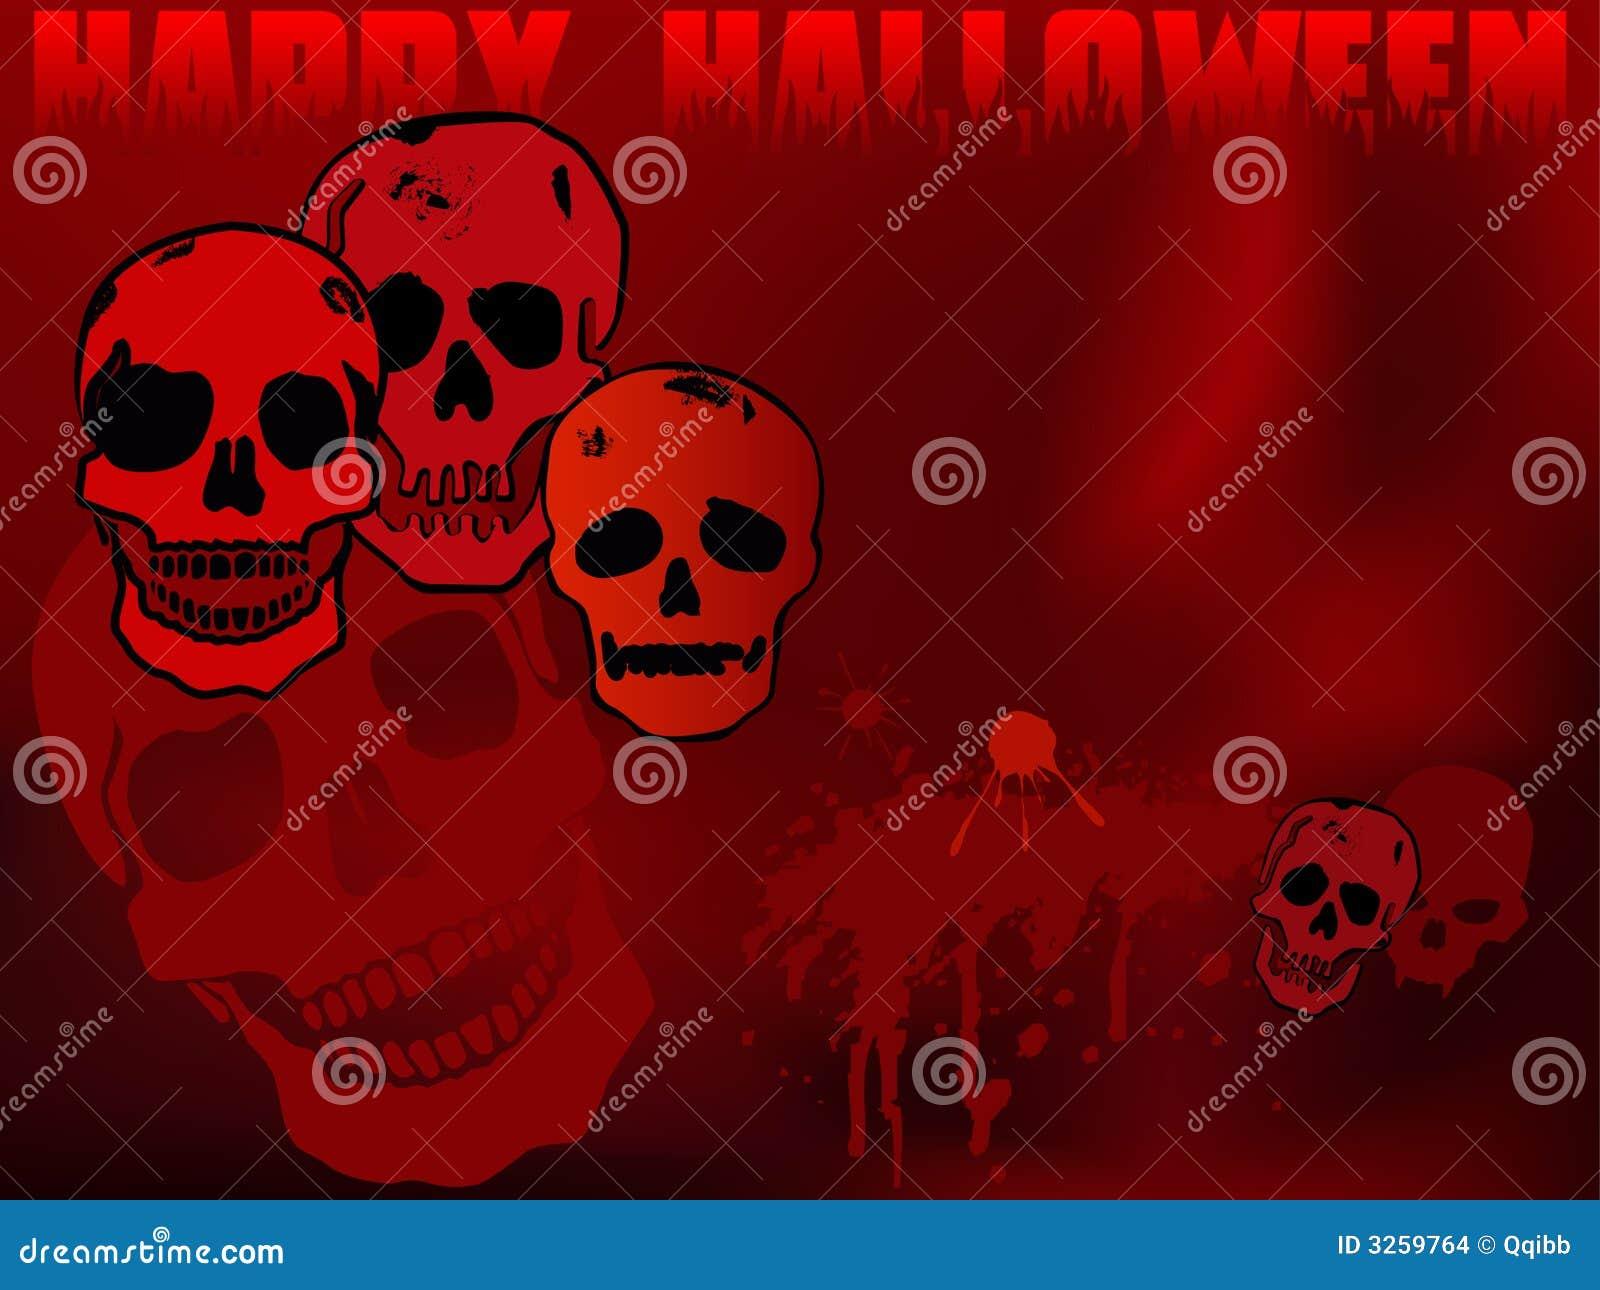 Simple Wallpaper Halloween Skull - halloween-skulls-wallpaper-3259764  Trends_423487.jpg